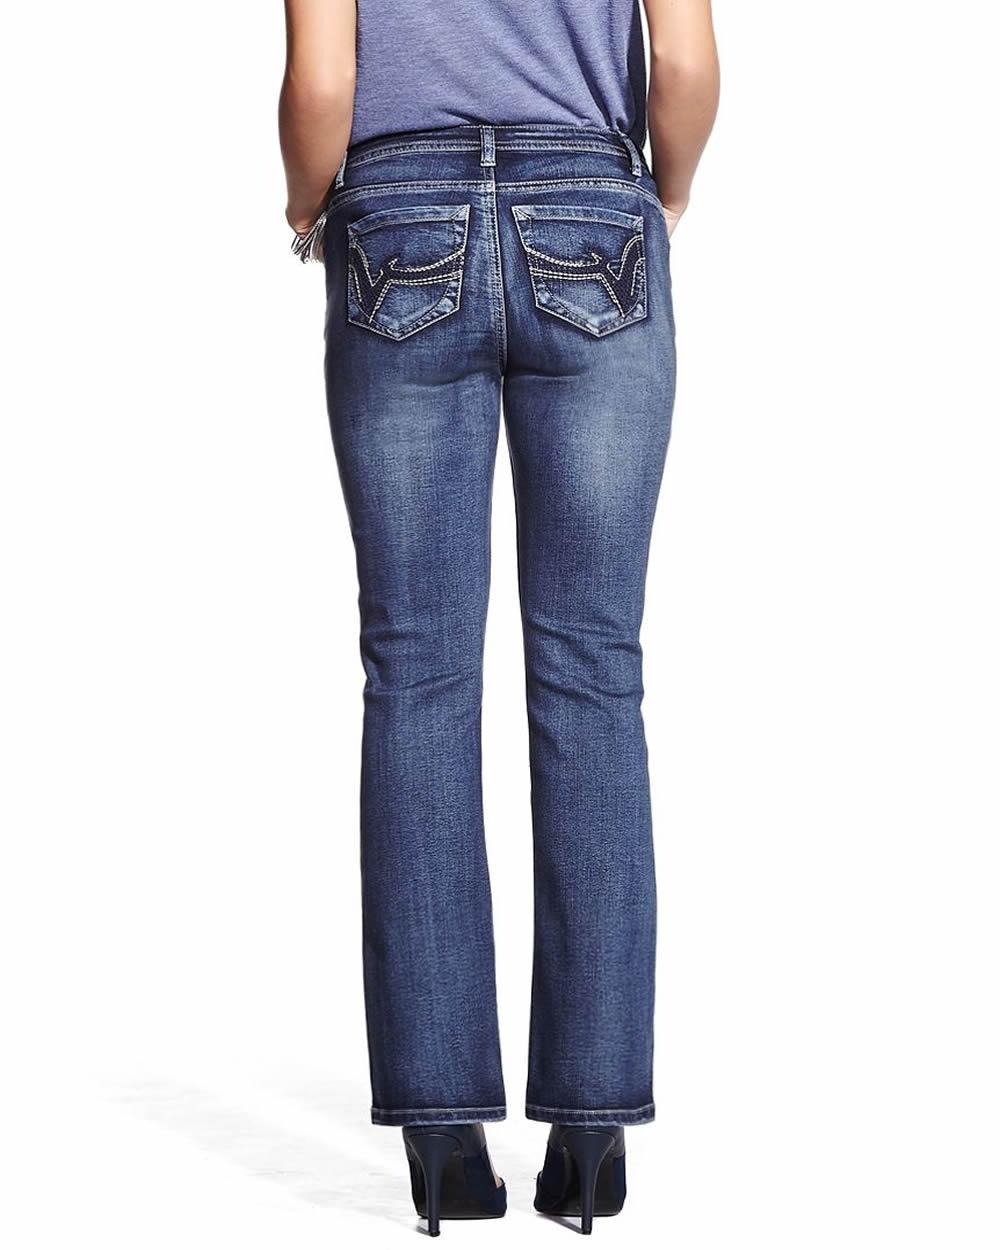 Petite Only Denim Boot Cut Jeans   Petites